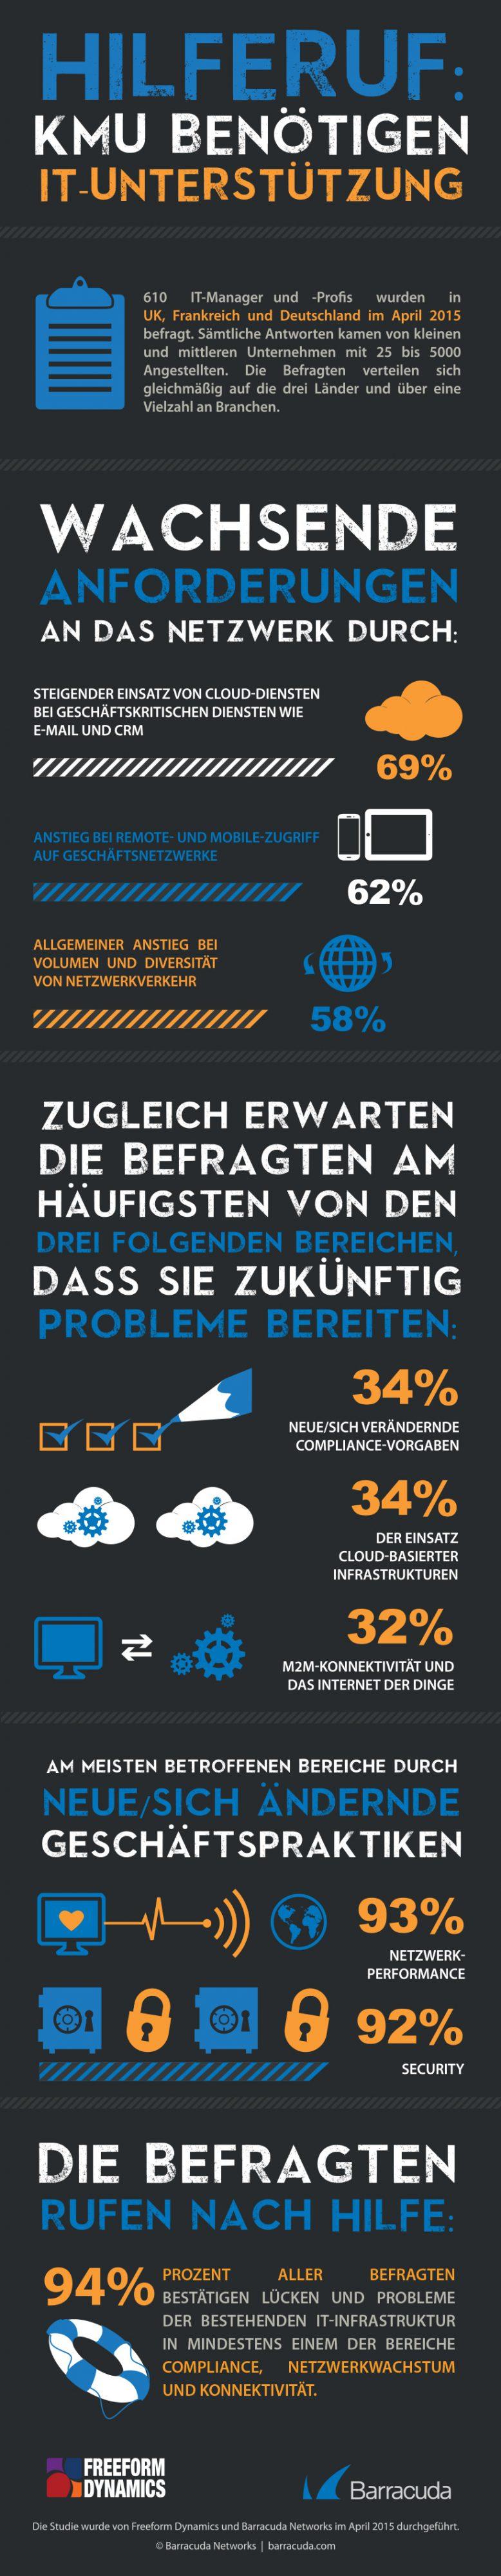 infographic_mid-market_europe_de